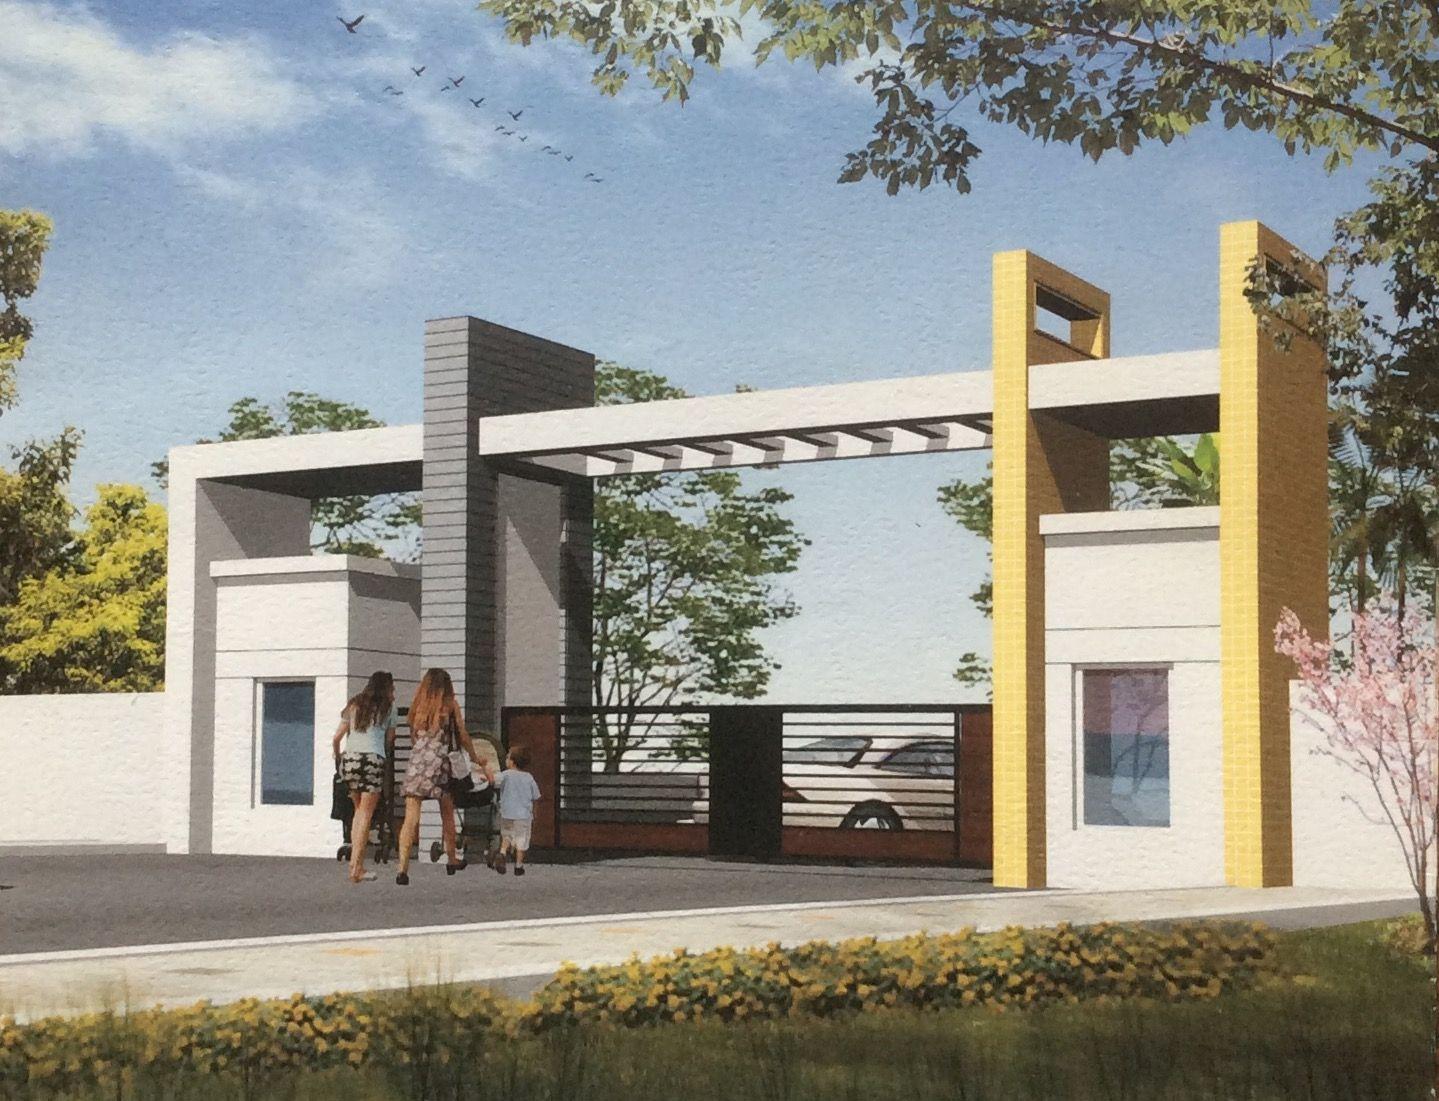 Pin By Prianto Aspri On The Gate Entrance Gates Design Main Gate Design Entrance Design